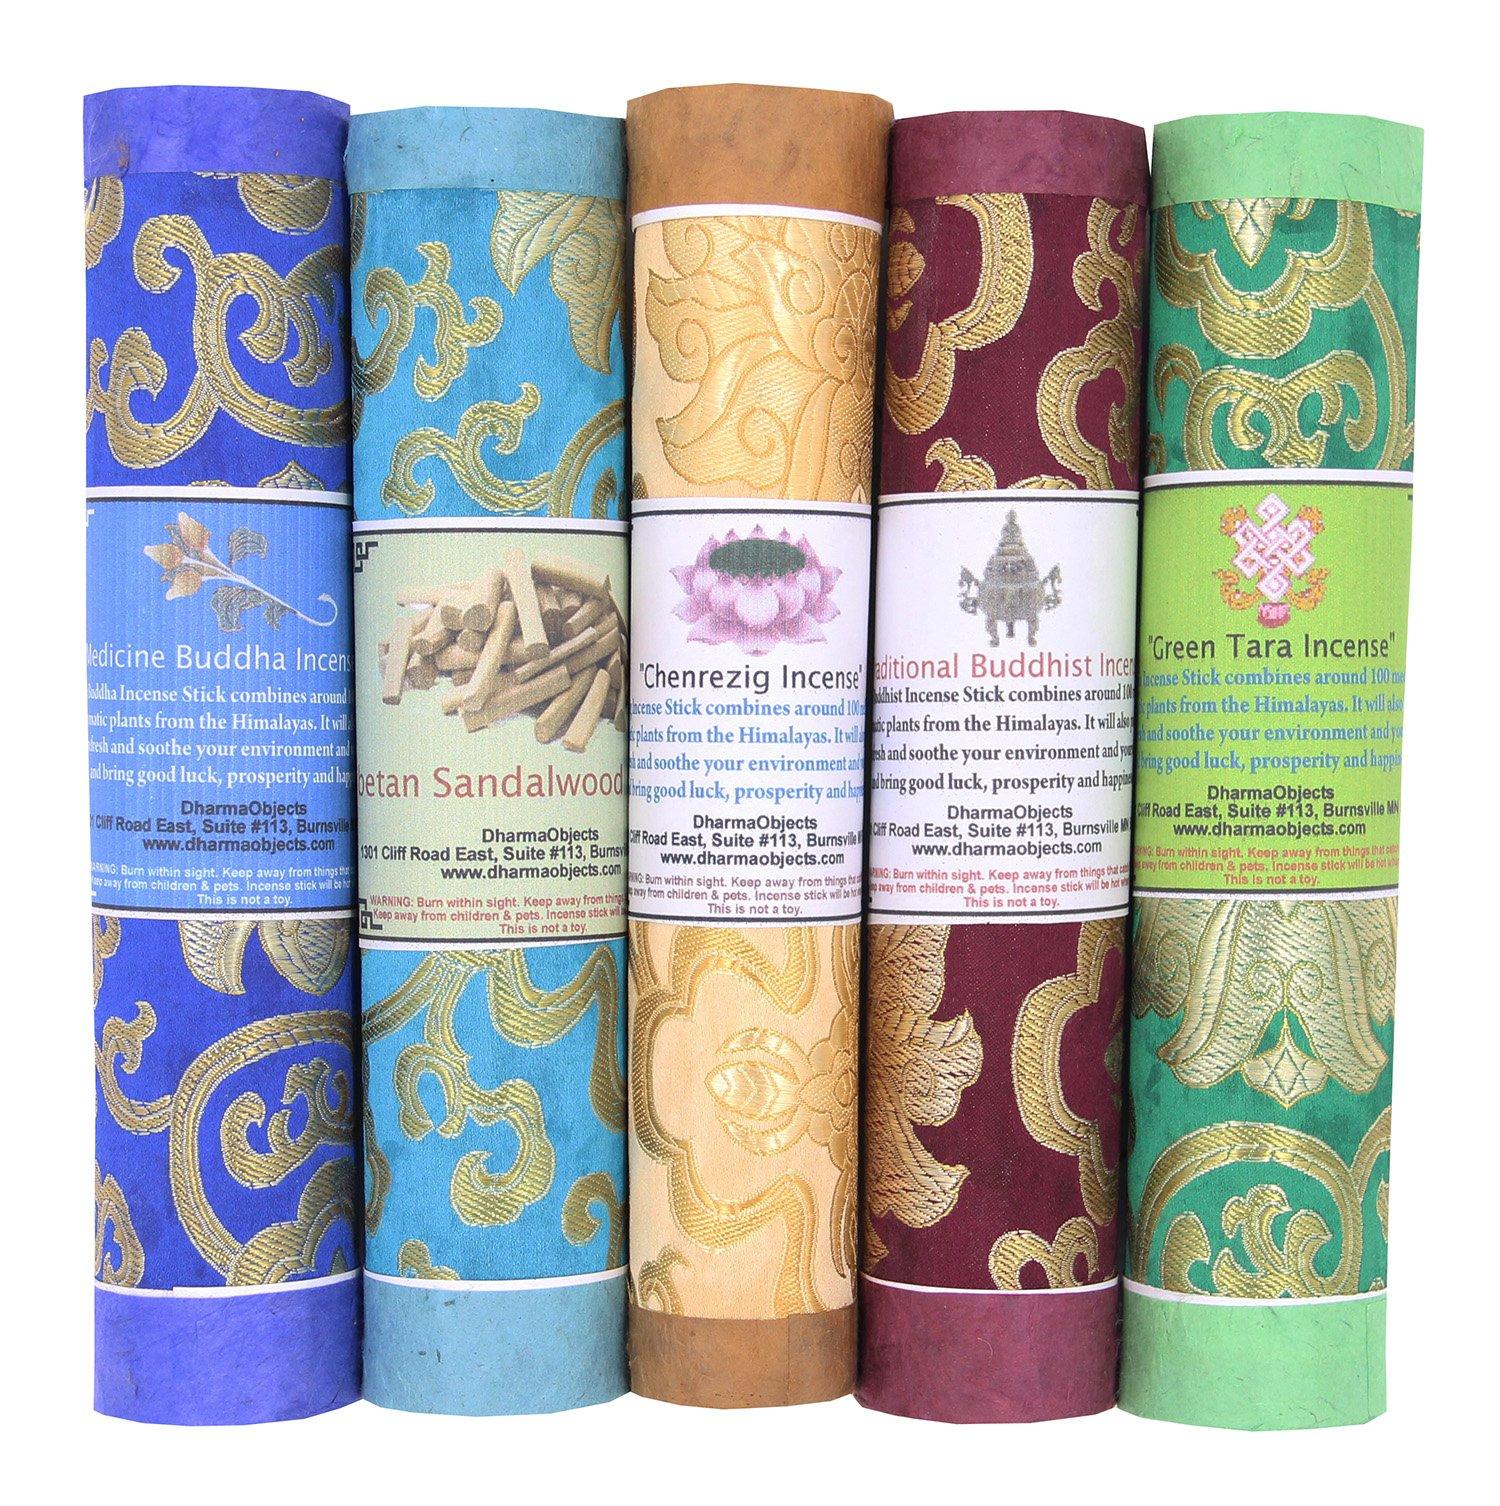 DharmaObjects 5 Packs Variety Tibetan Spiritual and Medicinal Incense Sticks